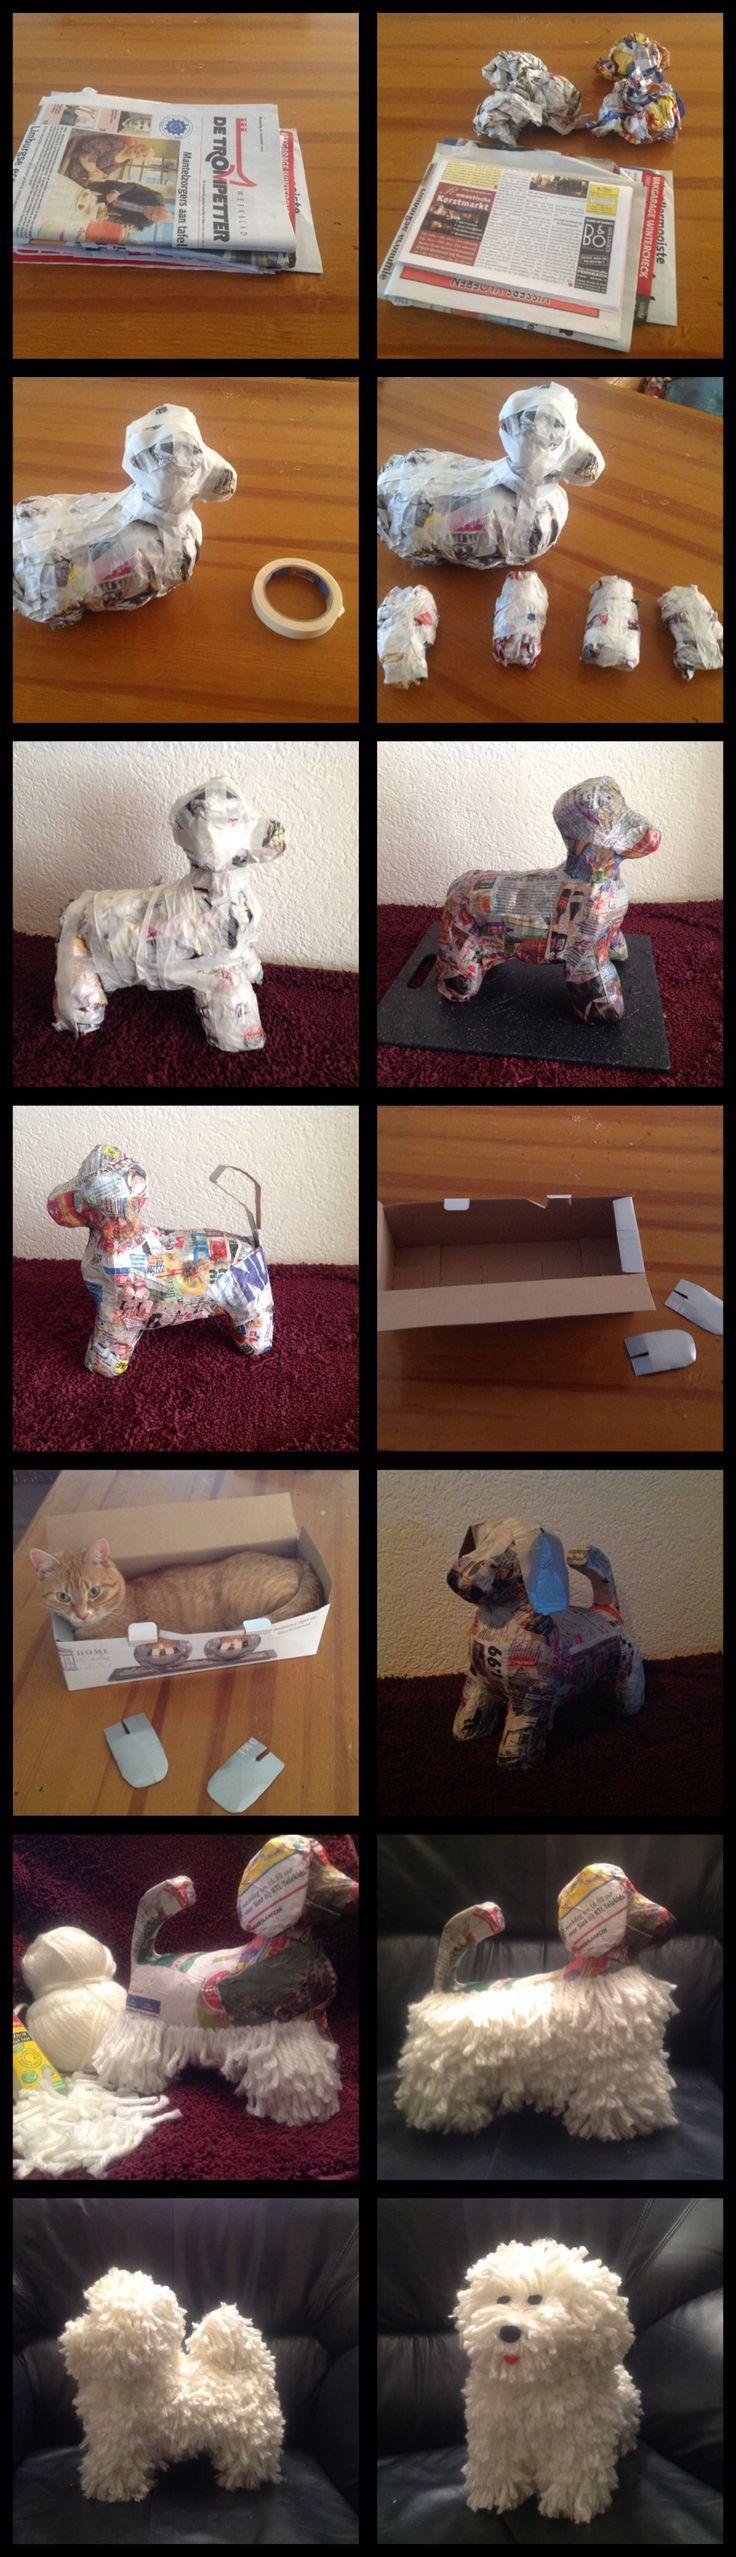 DIY Adorable Puppy! Mijn papier maché hondje My paper mache dog